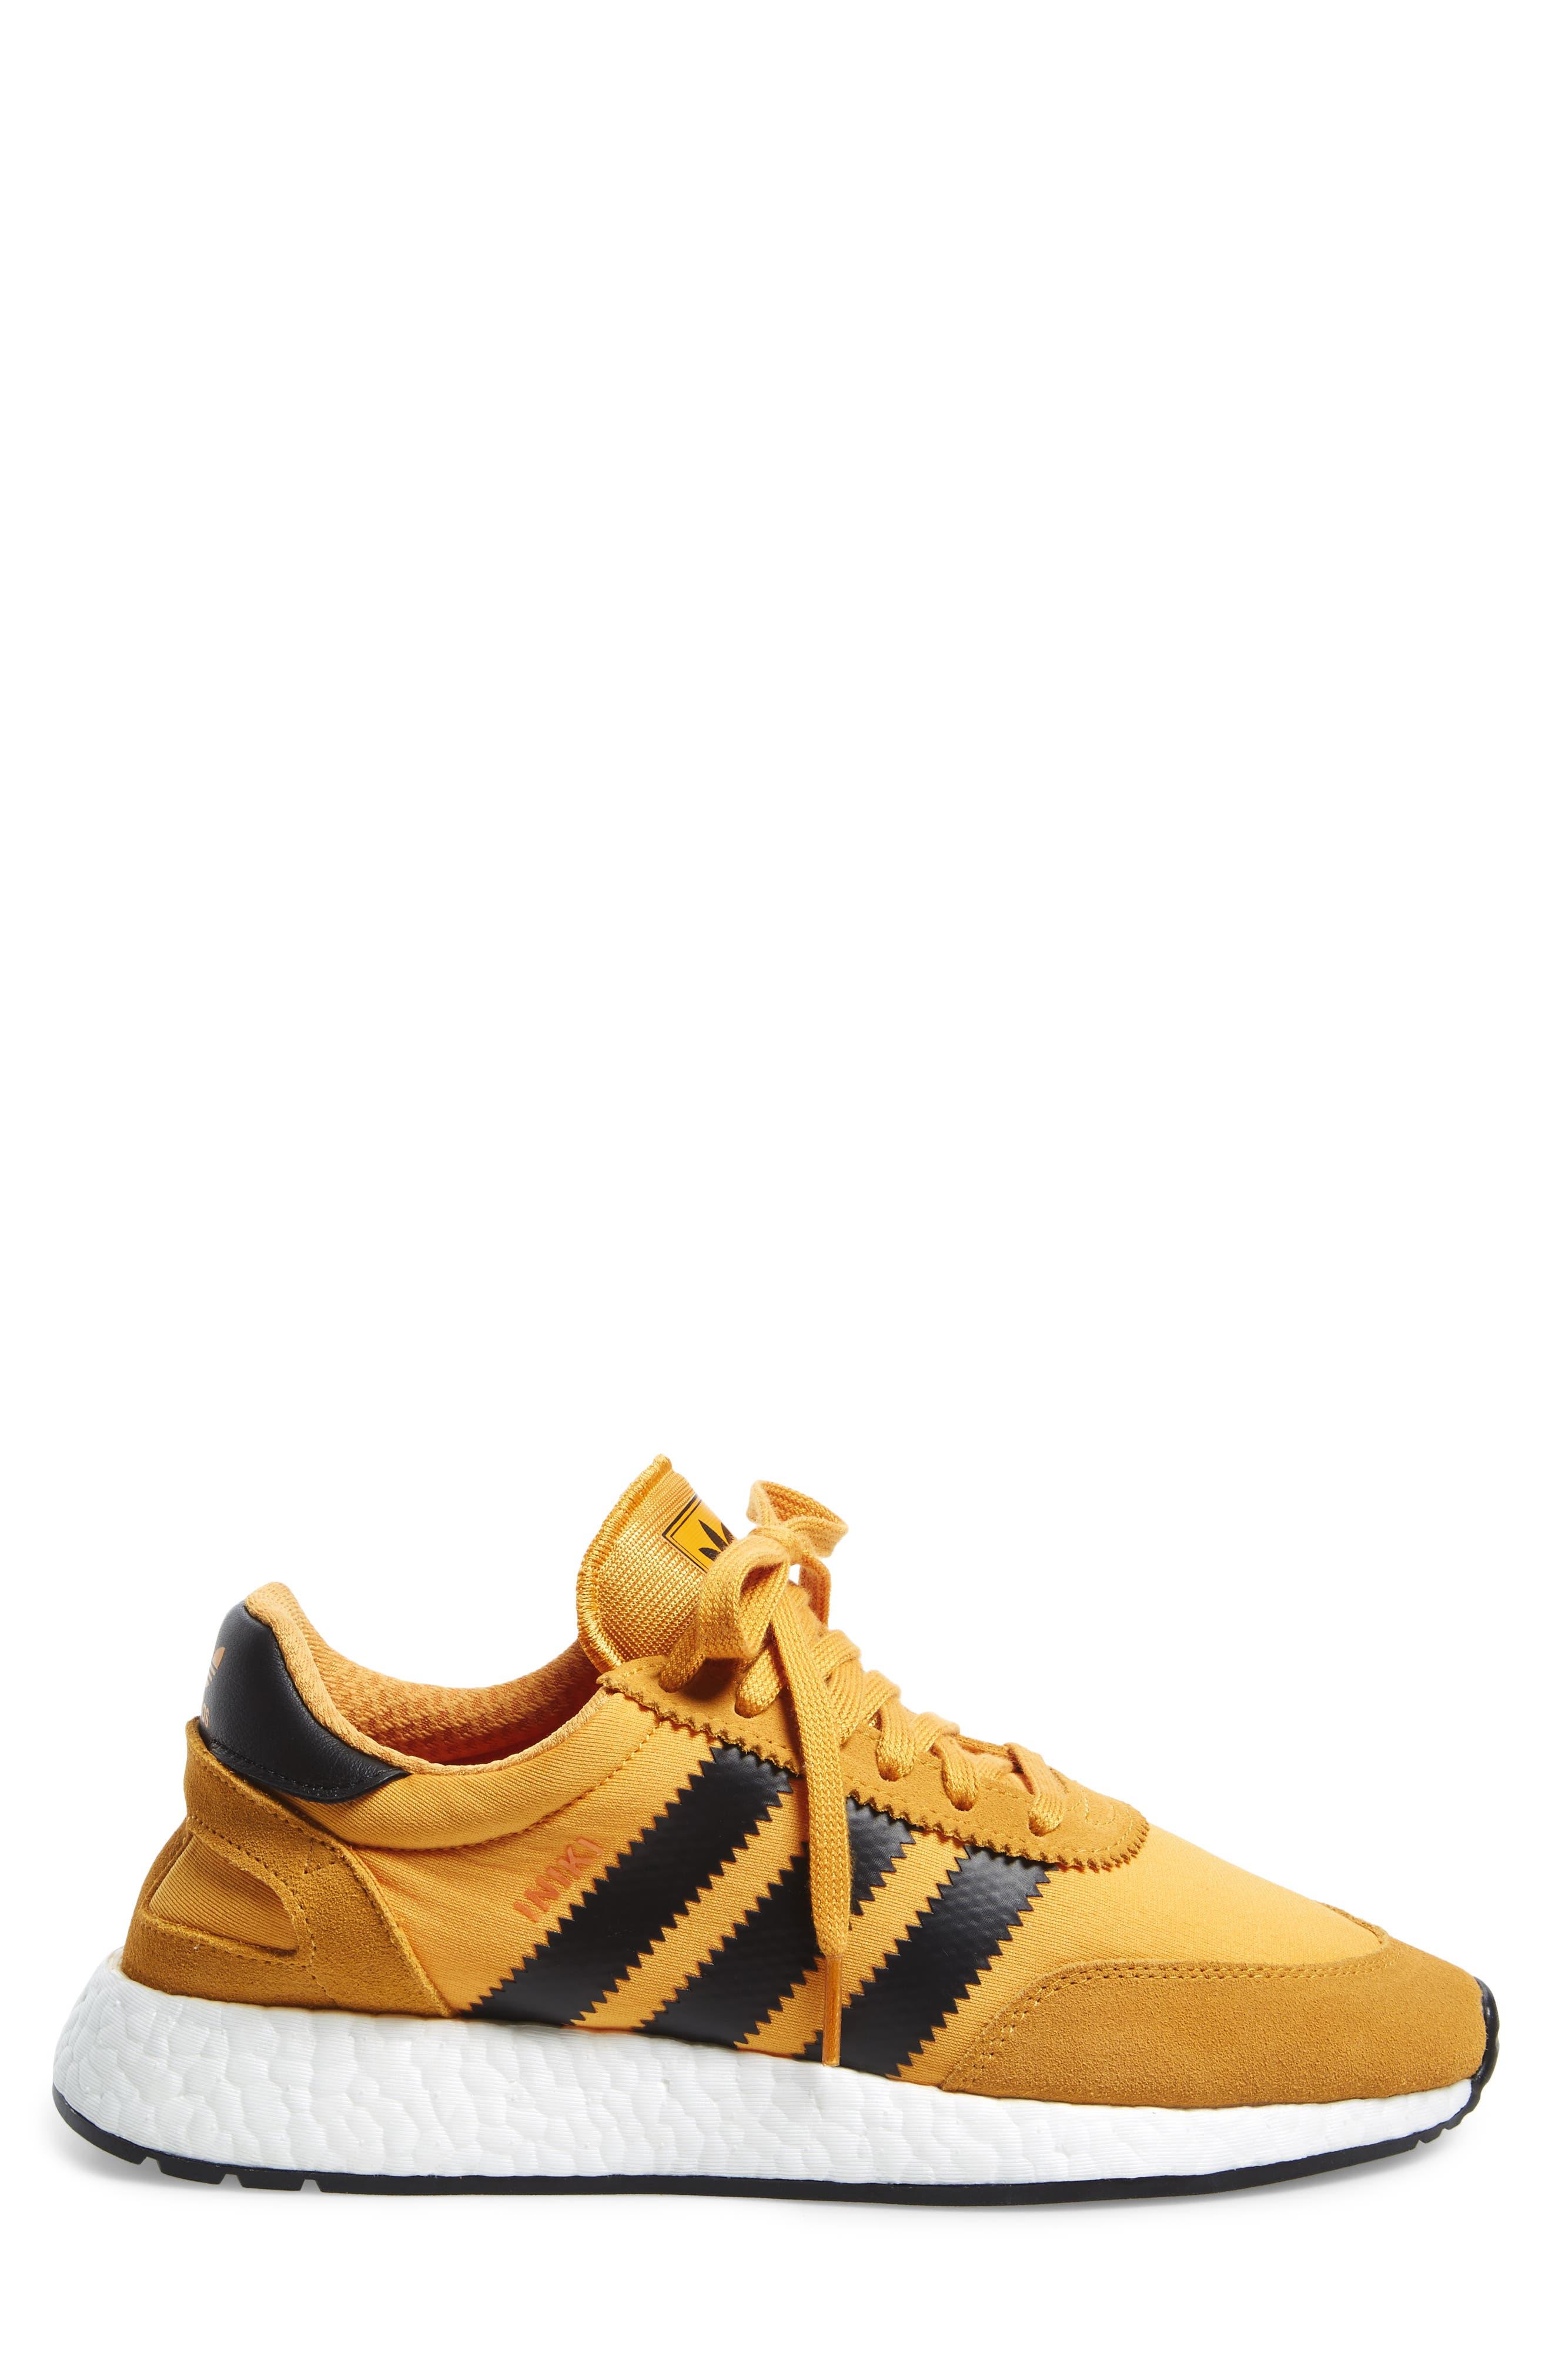 I-5923 Sneaker,                             Alternate thumbnail 3, color,                             Tactile Yellow/ Black/ White